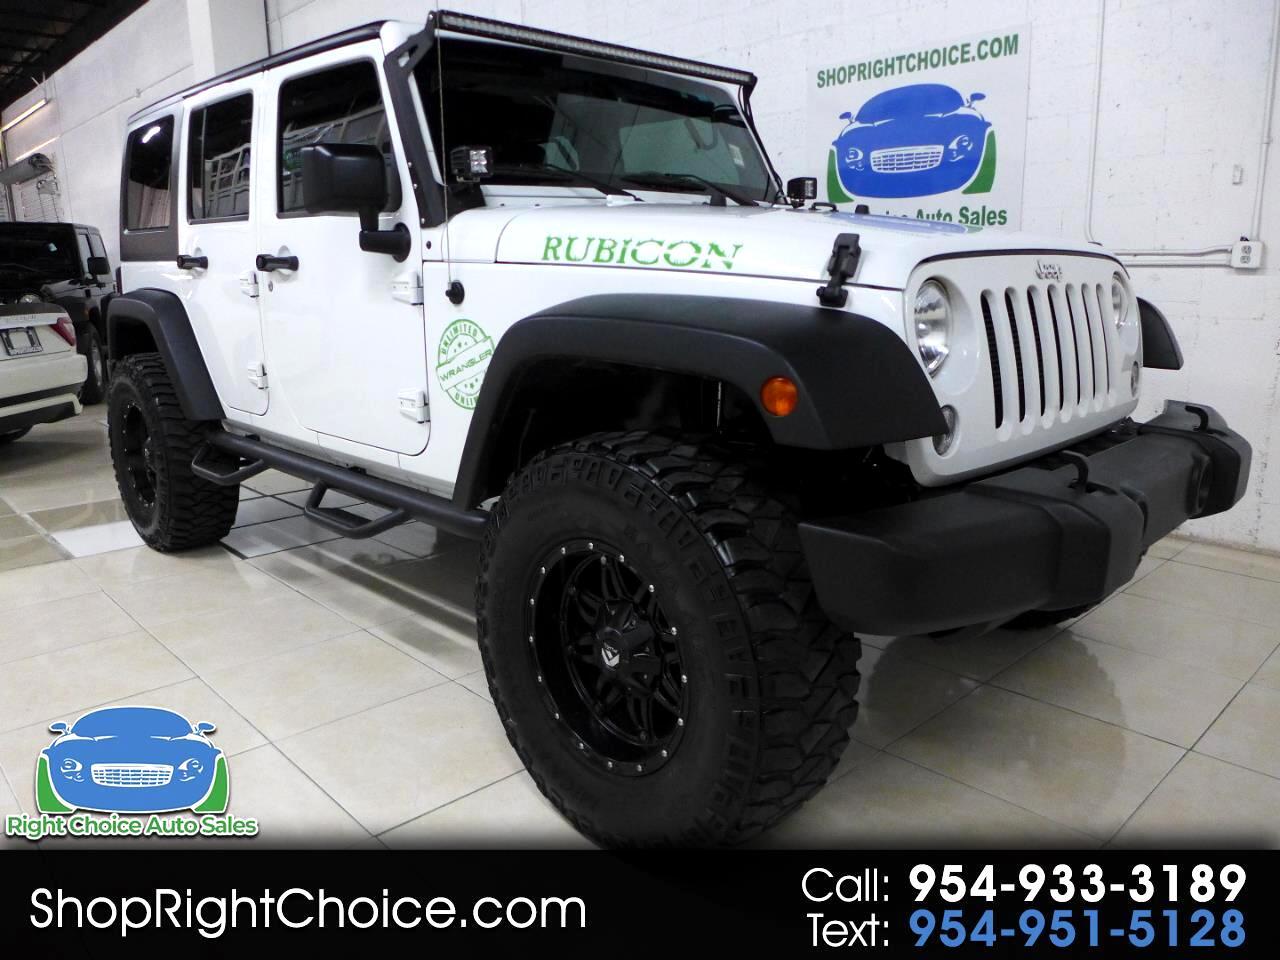 Jeep Wrangler Unlimited Rubicon 4WD 2015